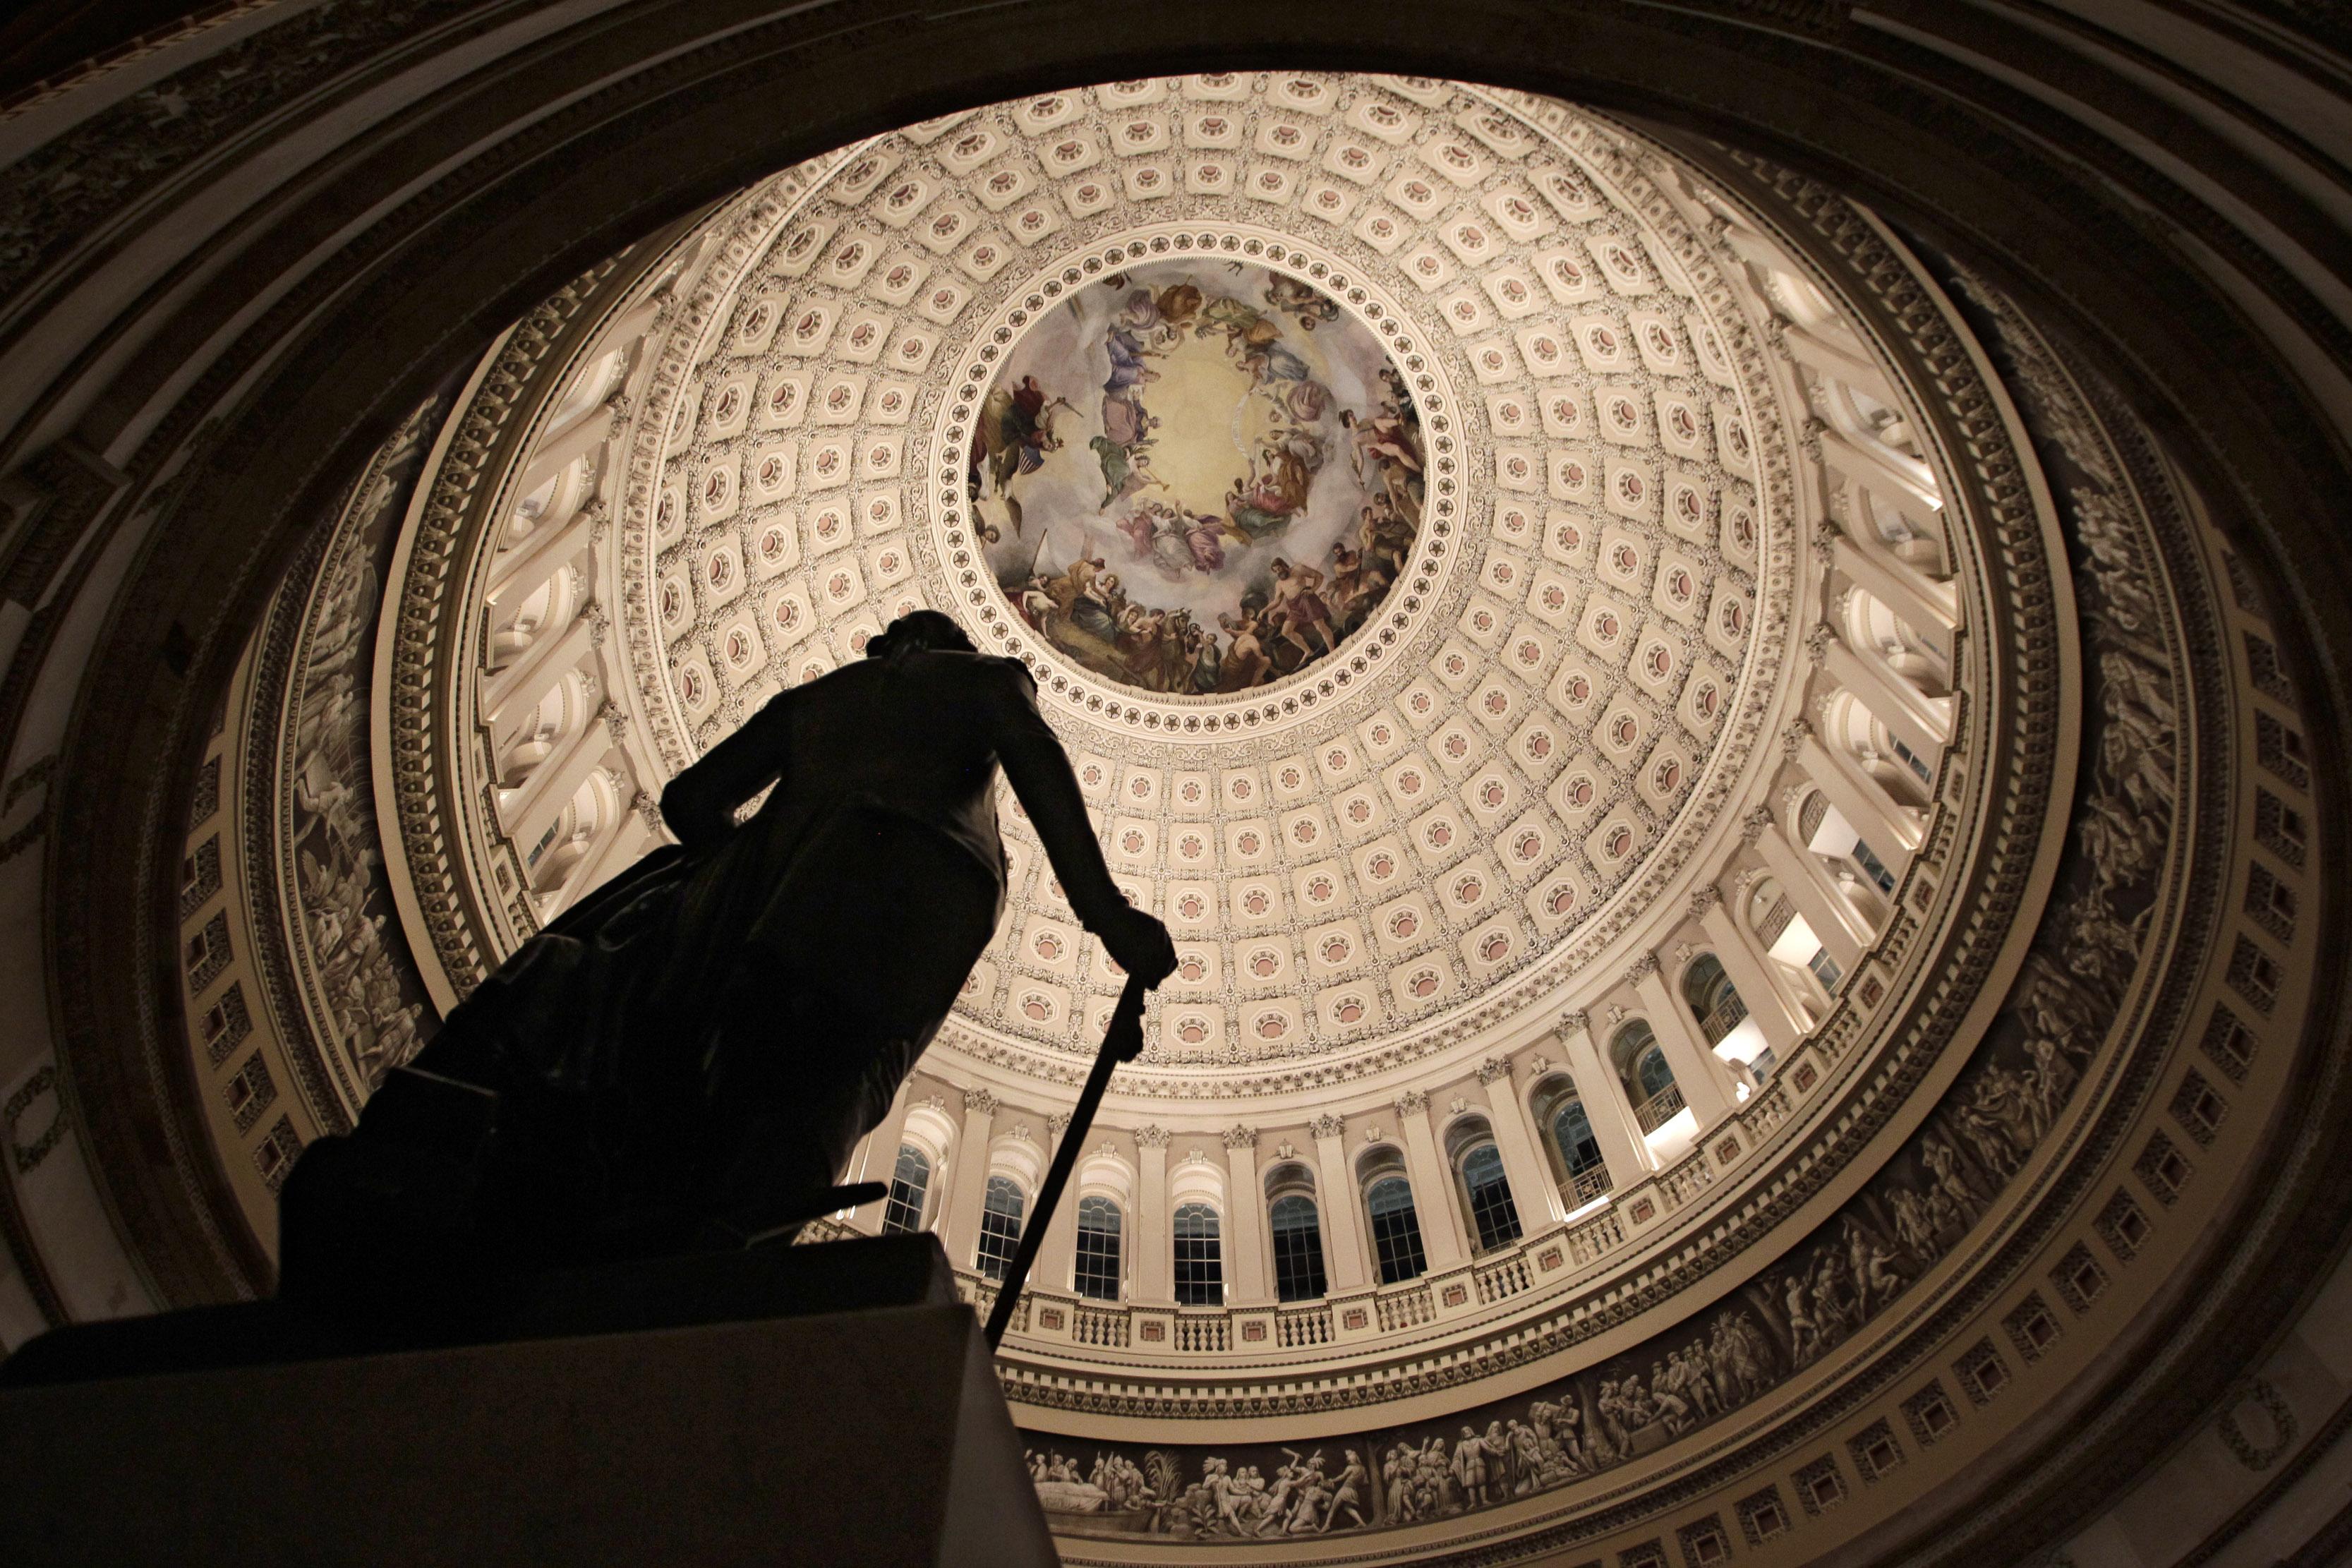 The rotunda of the U.S. Capitol.